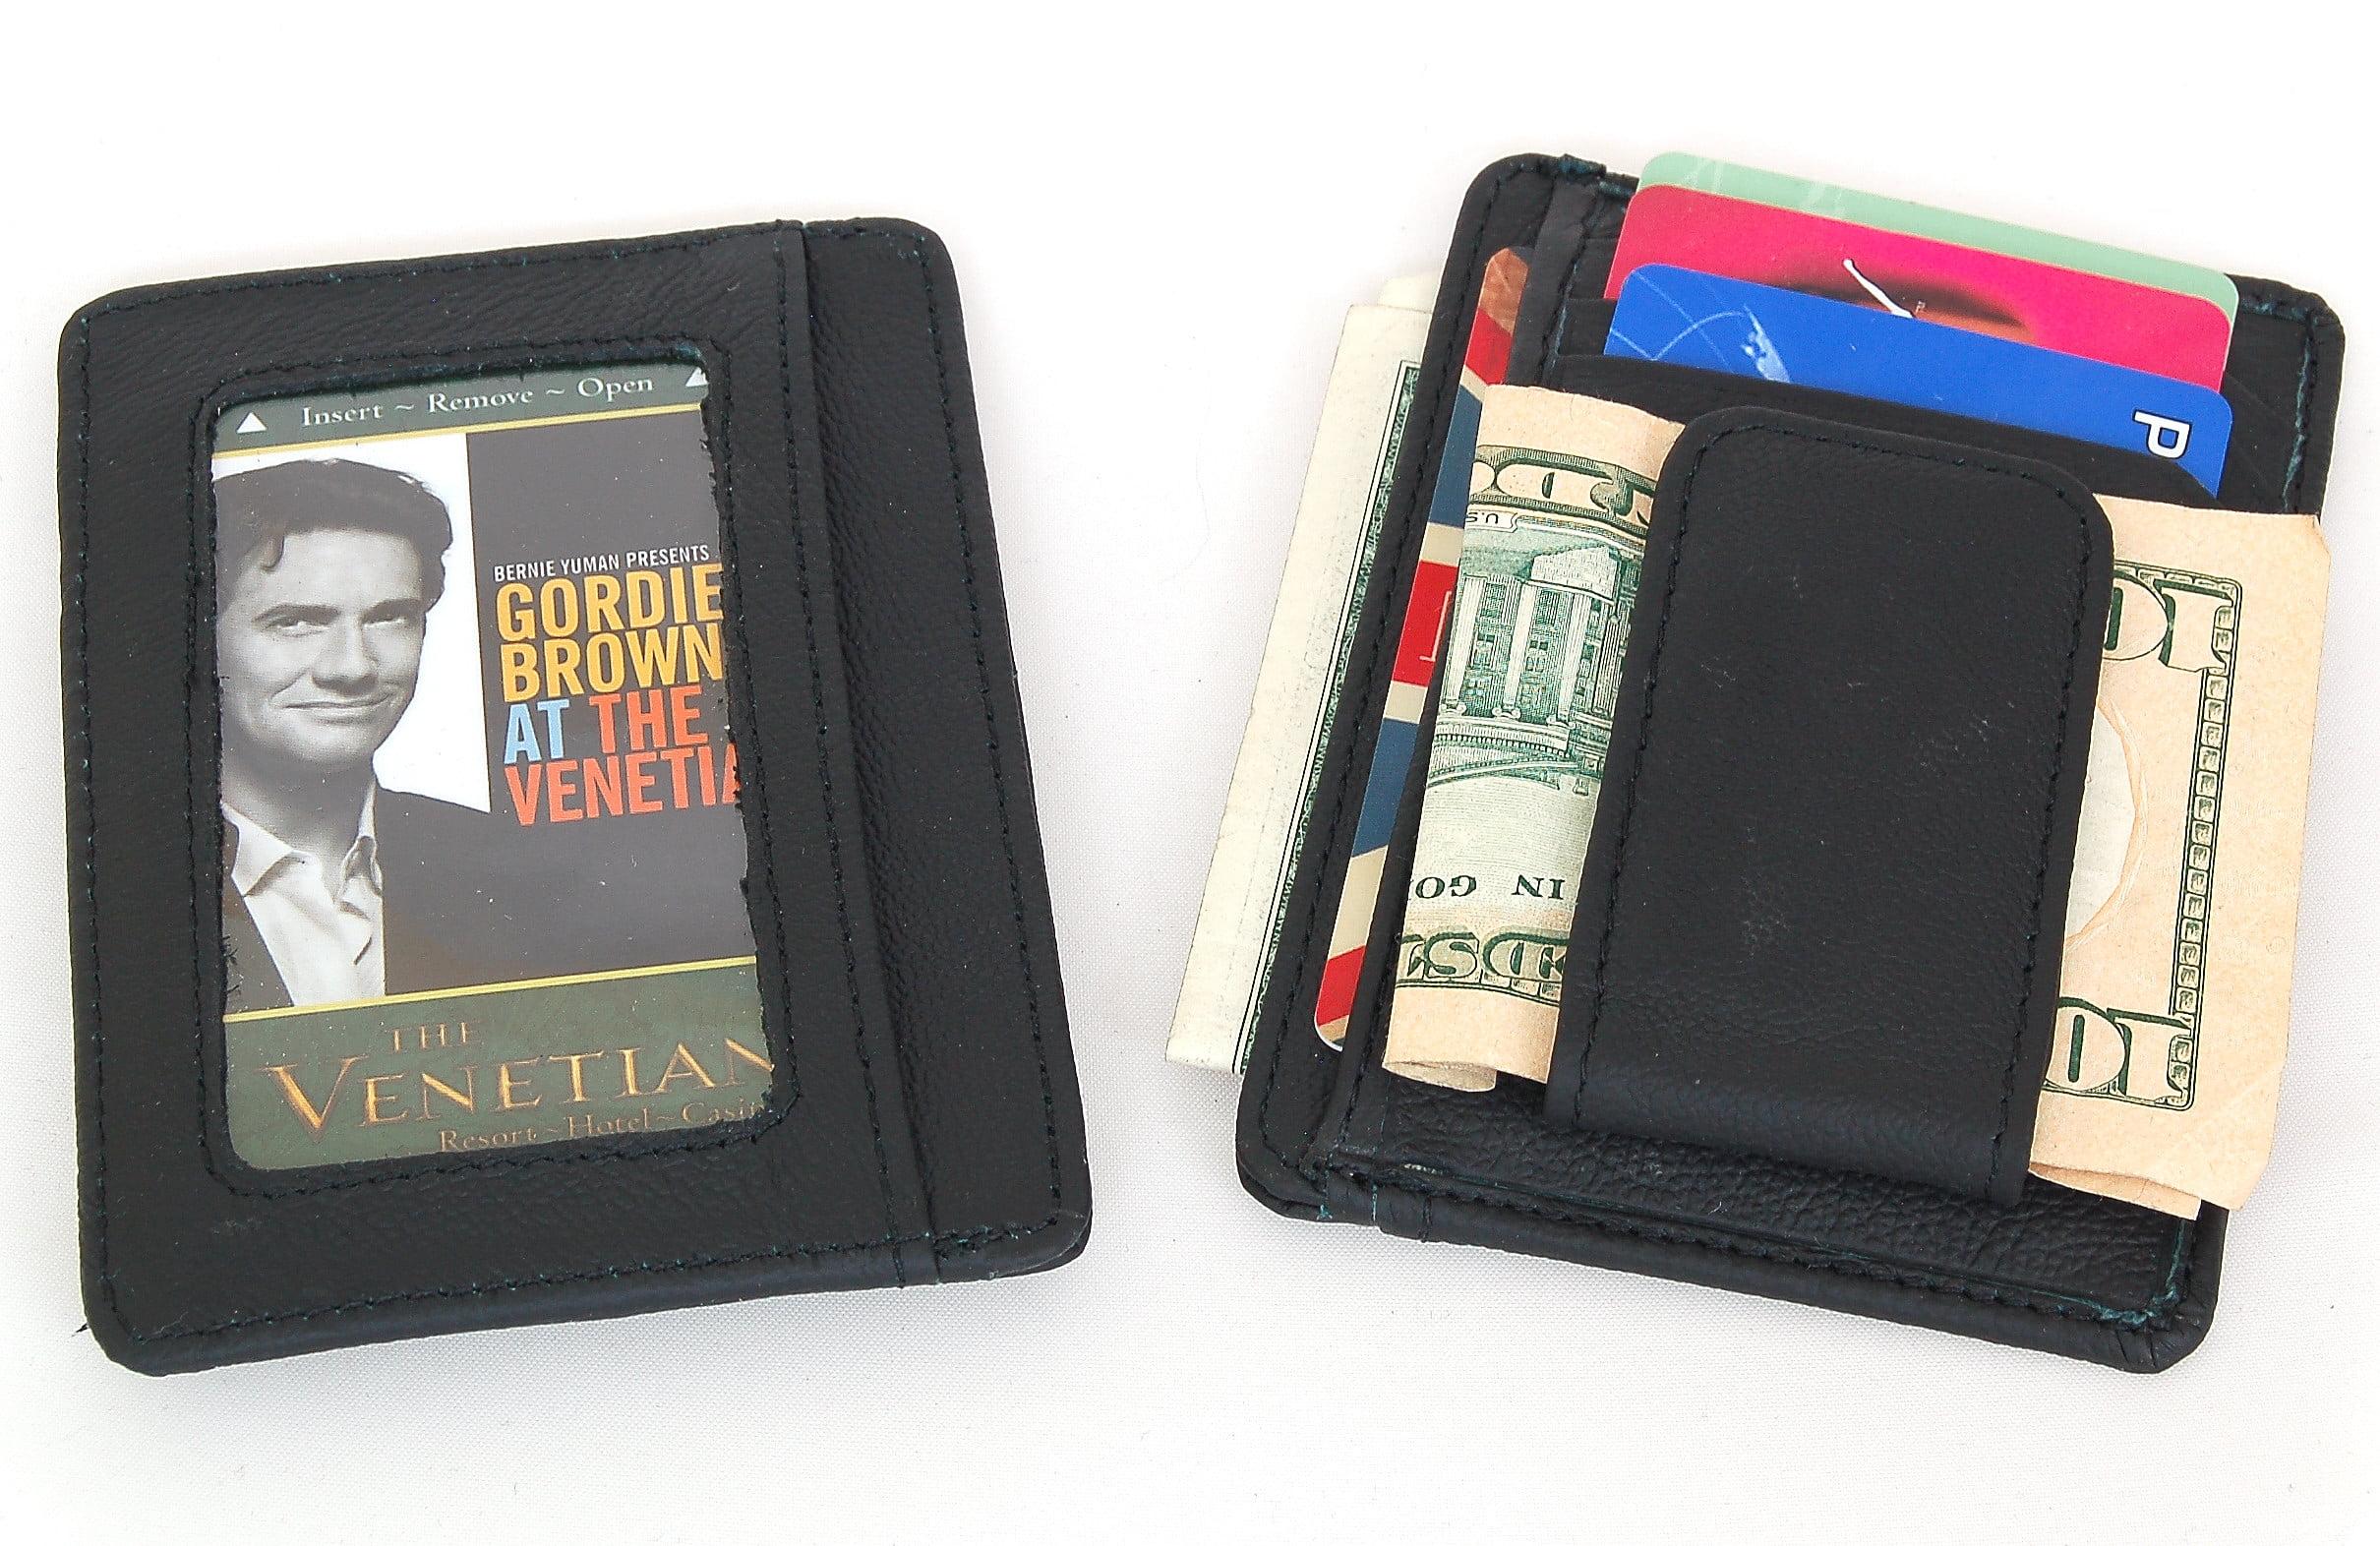 sbr designs mens leather wallet money clip credit card id holder front pocket thin slim new walmartcom - Mens Money Clip Credit Card Holder